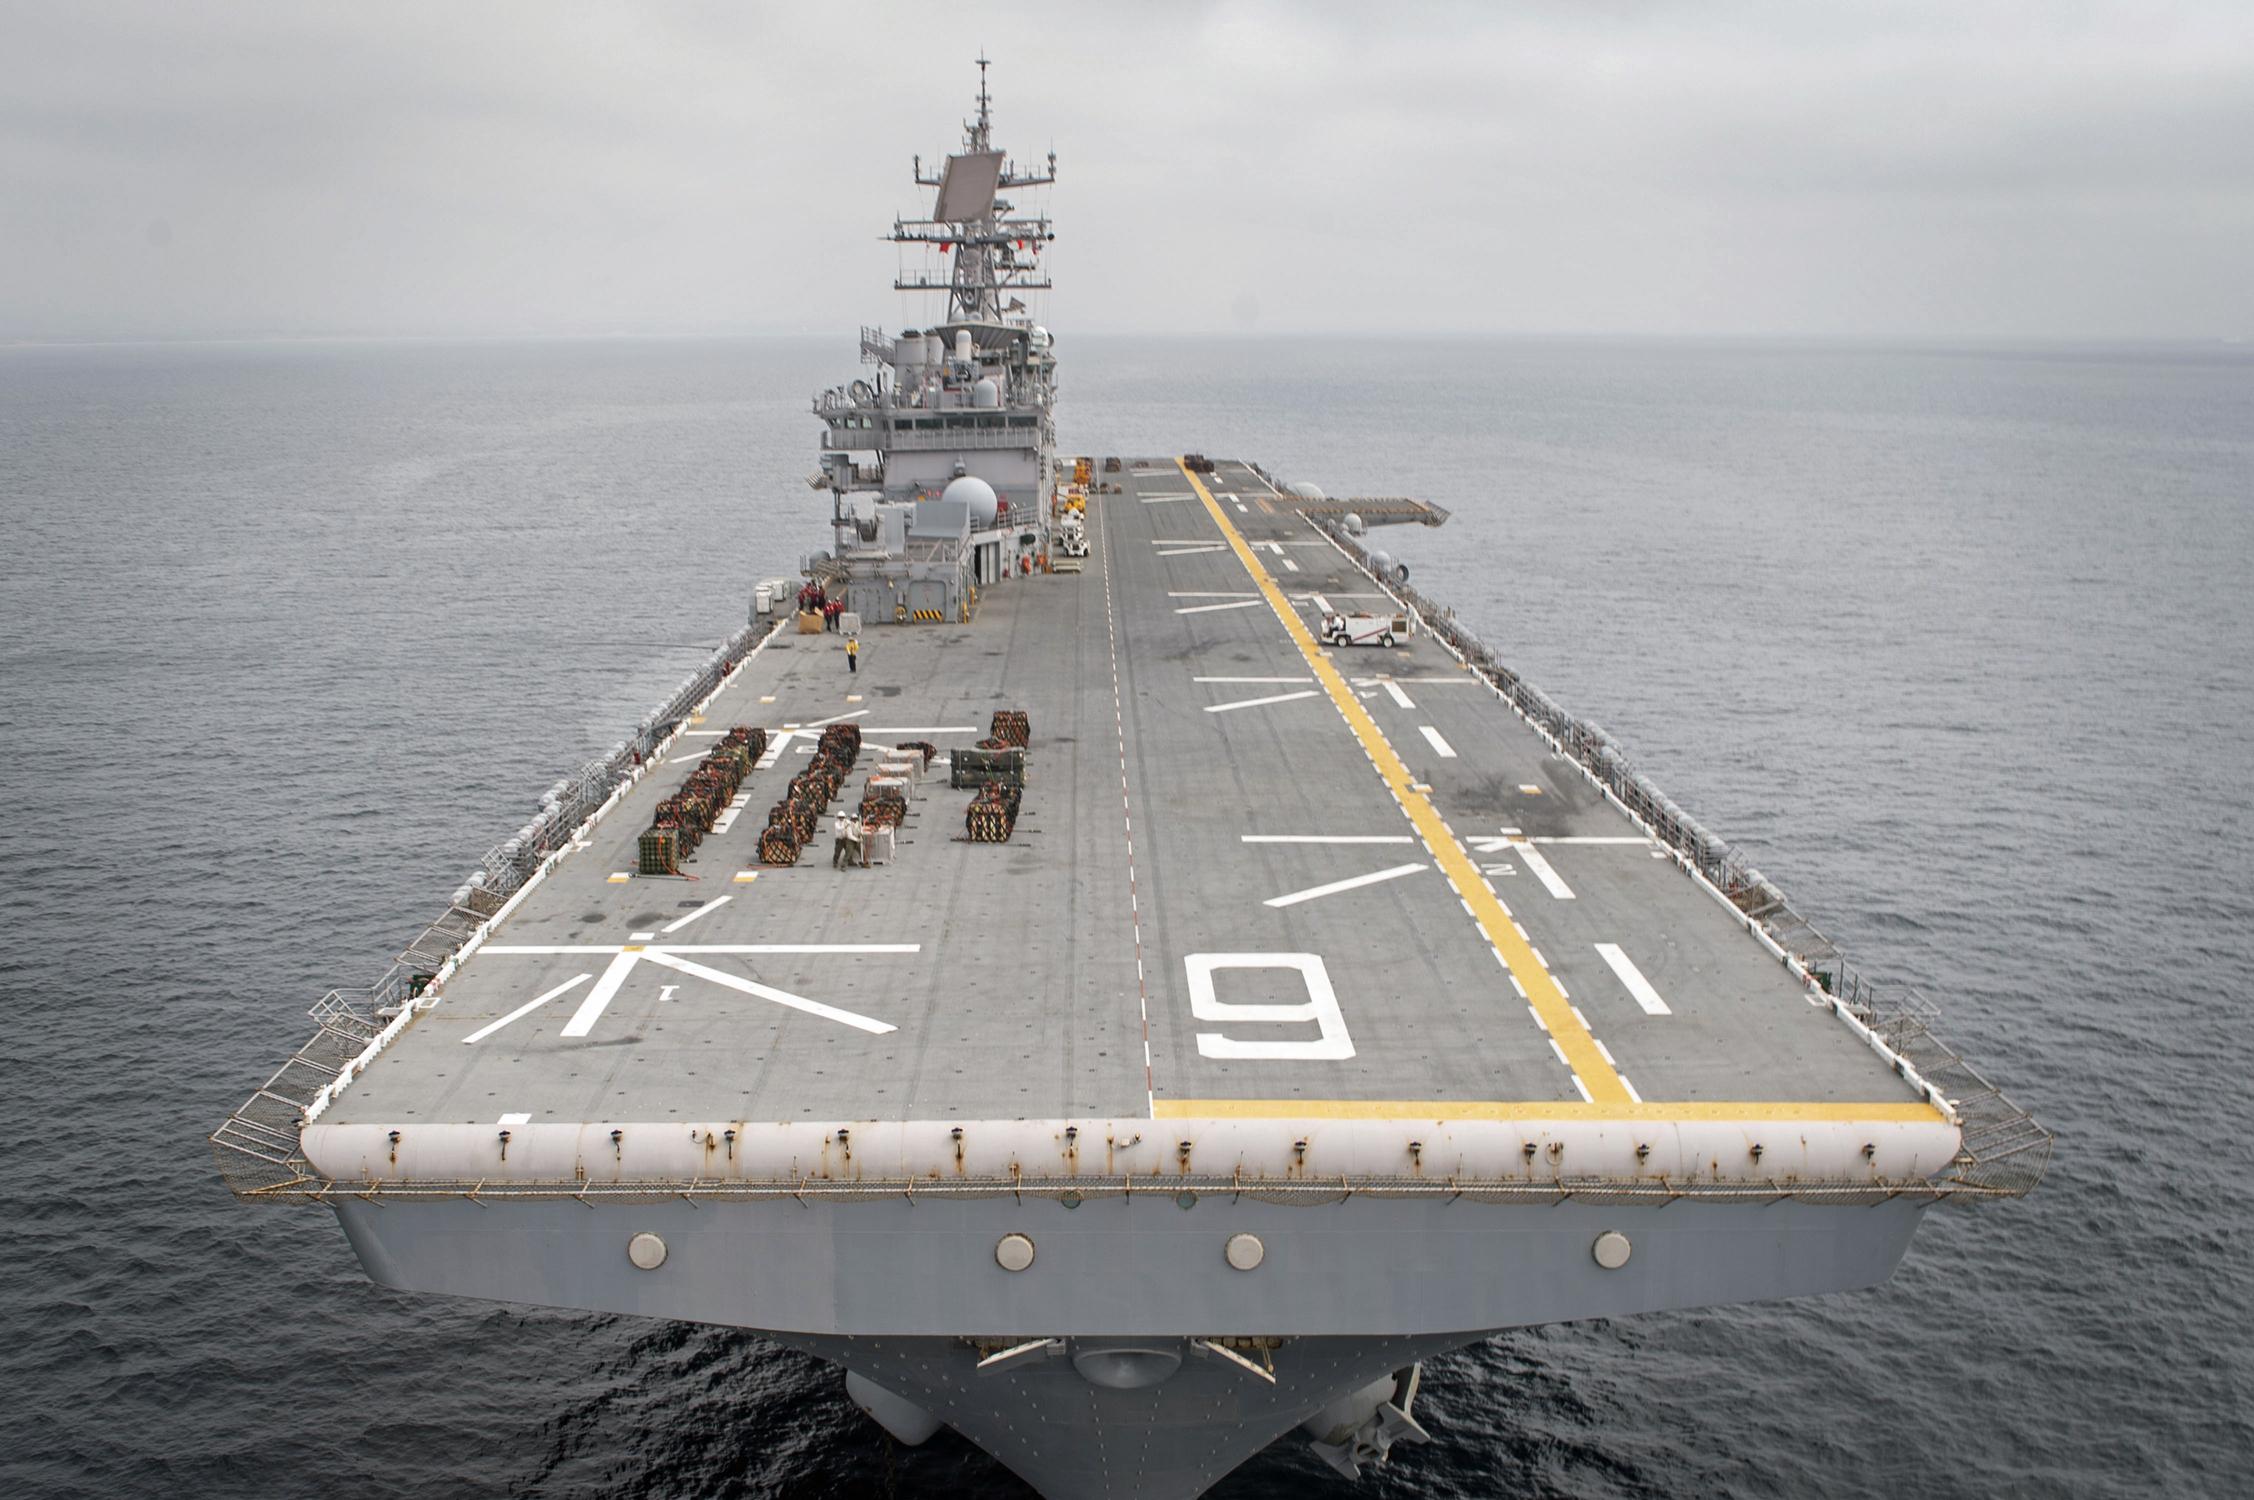 Amphibious assault ship (LHA - LHD - LPD) - Page 5 44368245664_f6895de5db_o